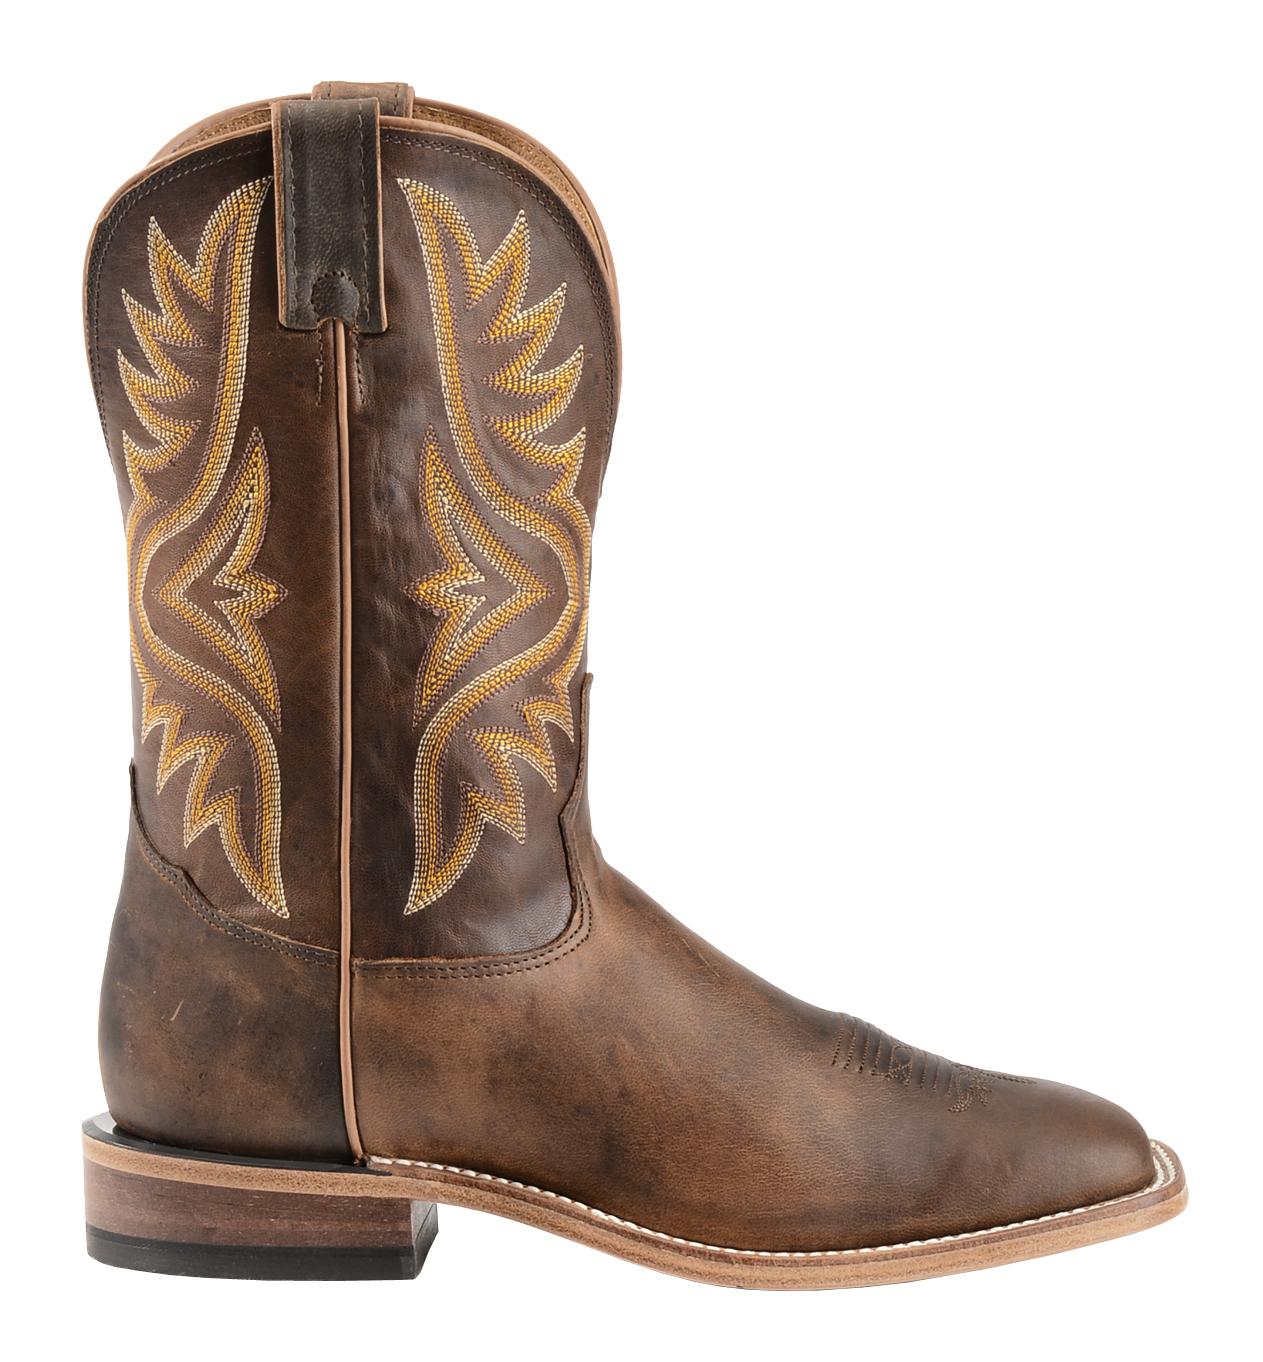 Tony Lama Tan Worn Goat Leather Americana Cowboy Boots